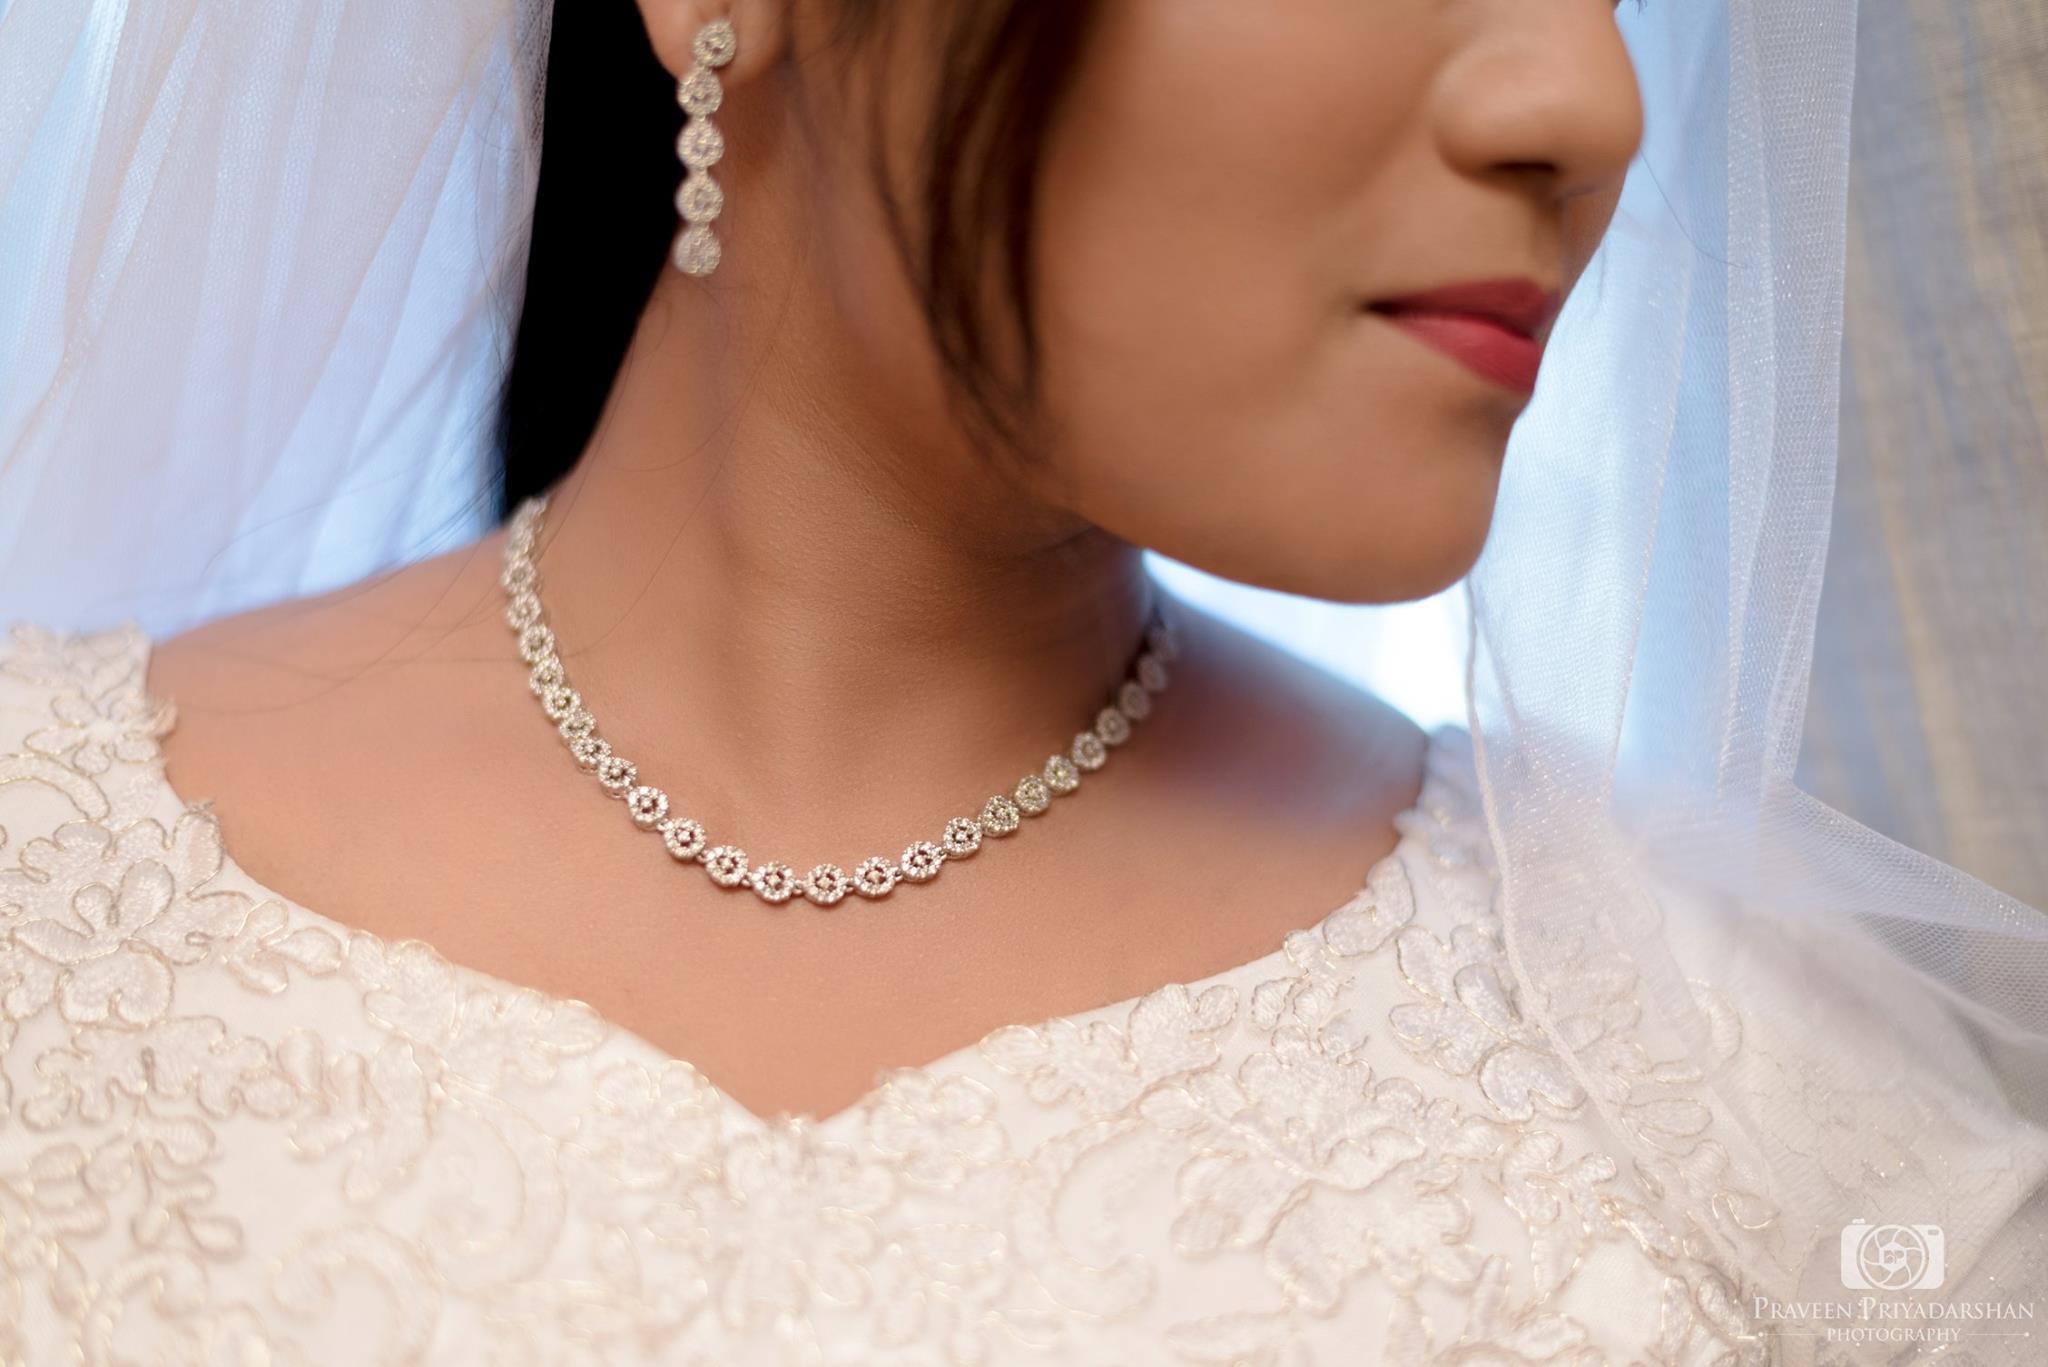 White Diamond Neck Jewelry